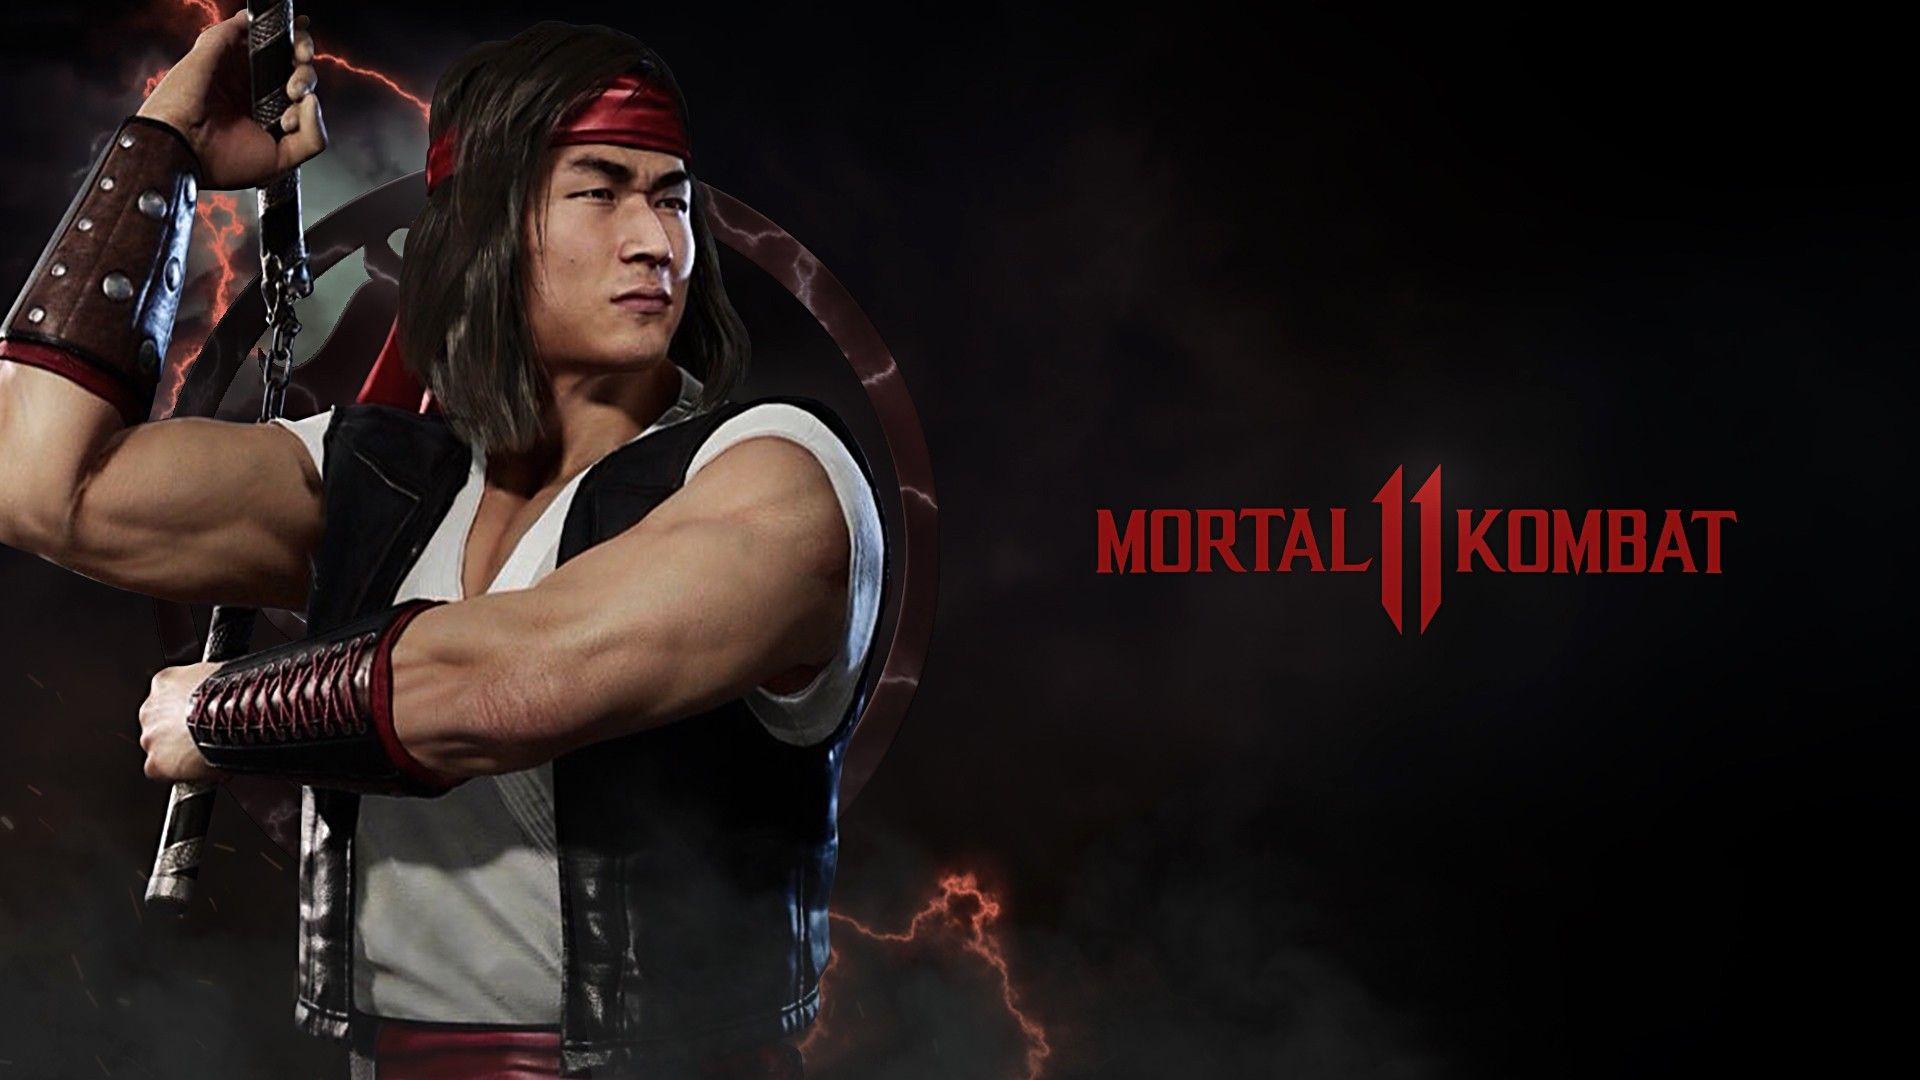 Liu Kang Tattoo: Pin By Trey Romich On Mortal Kombat 11